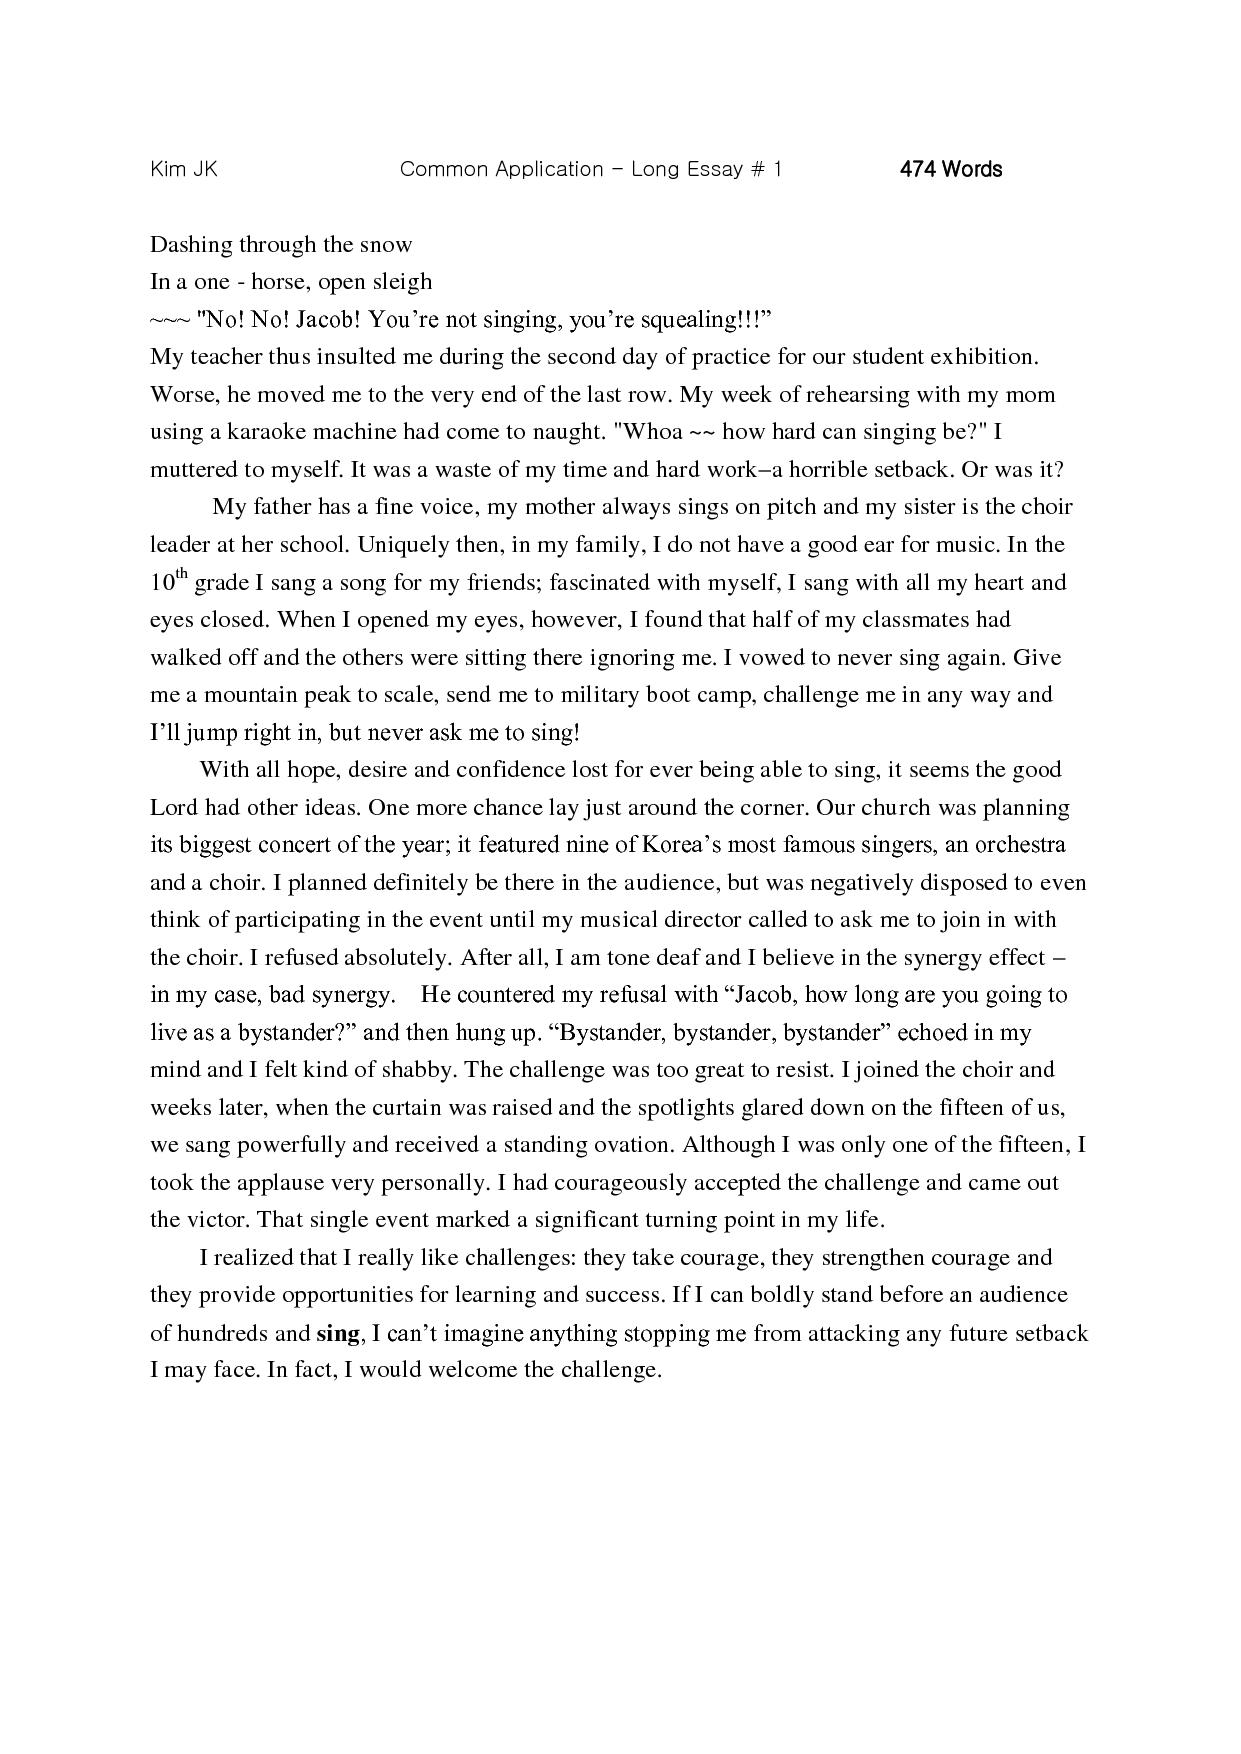 014 Essay Example Brilliant Ideas Of College Application Examples Format Targer Golden Dragon Fantastic Good Common